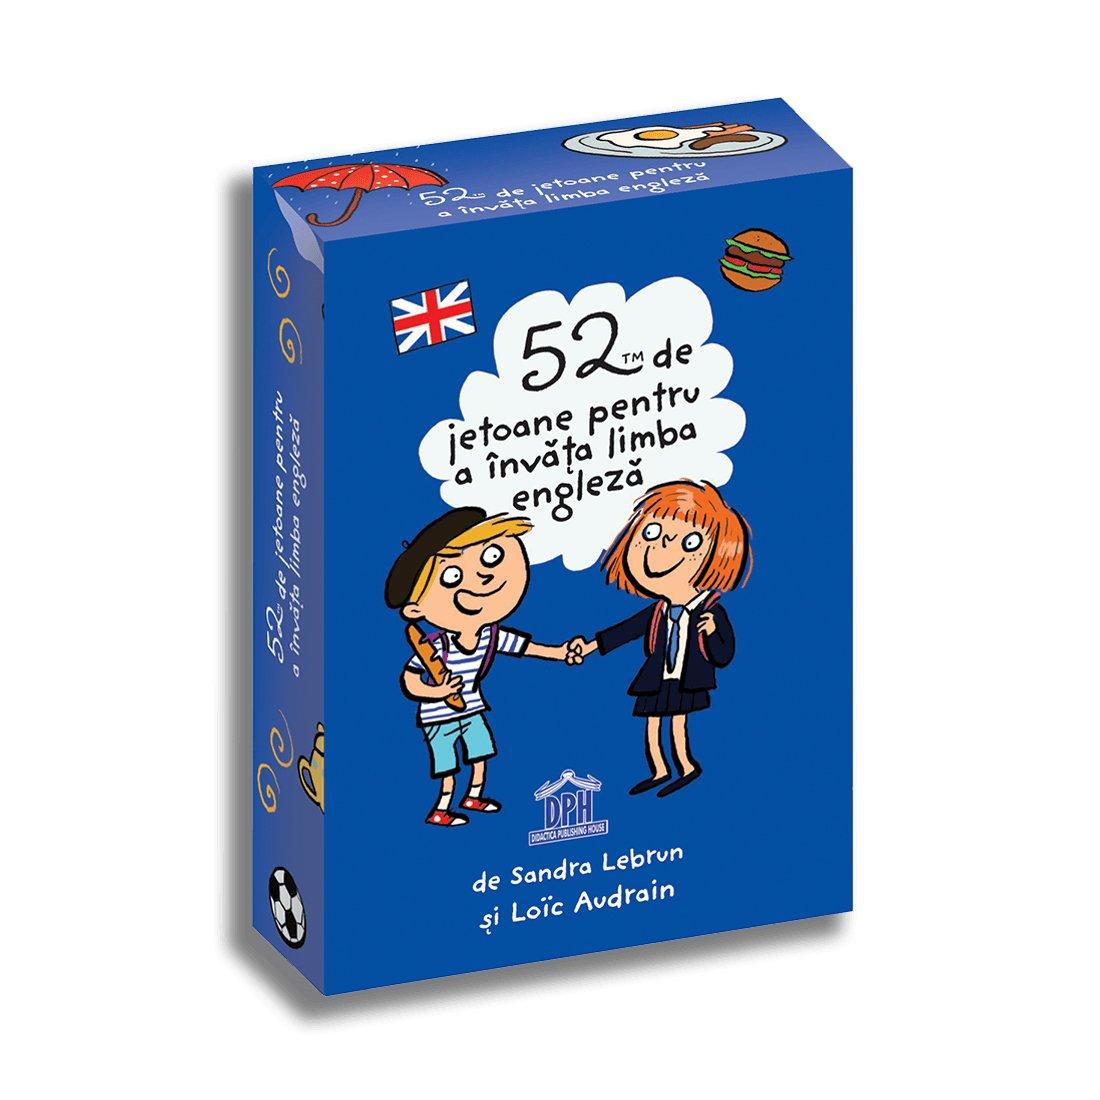 52 de jetoane pentru a invata limba engleza, Editura DPH